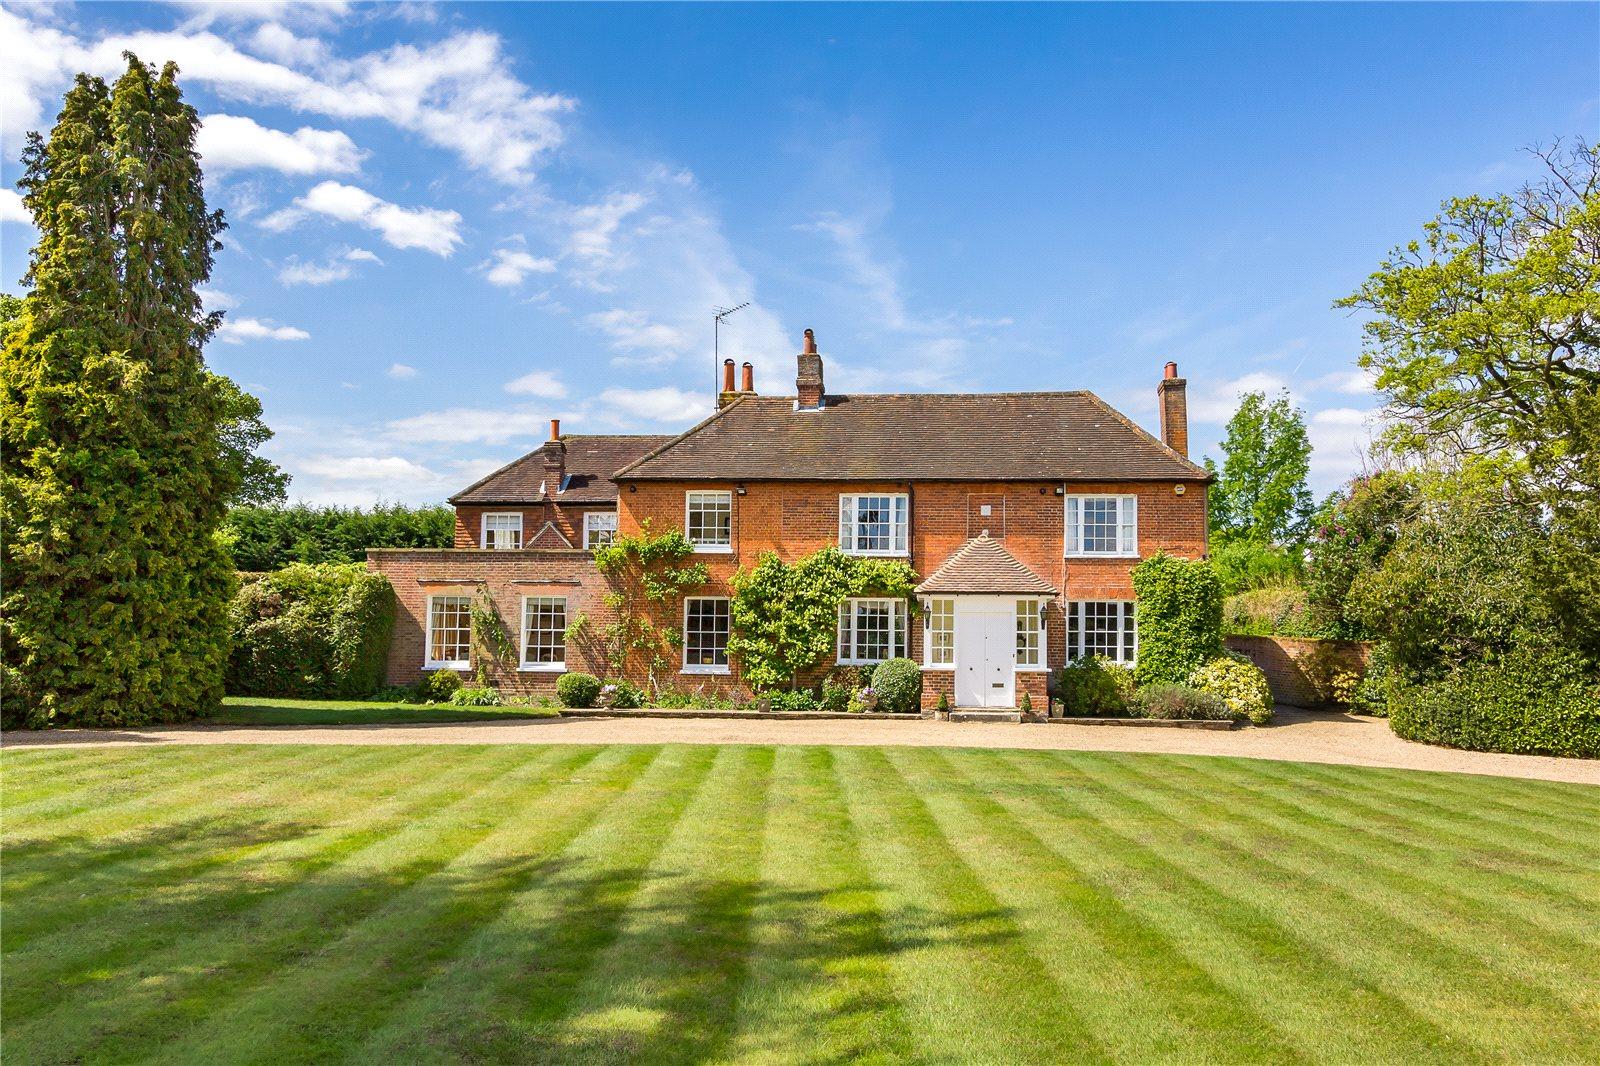 Casa para uma família para Venda às Frog Grove Lane, Wood Street Village, Guildford, Surrey, GU3 Guildford, Inglaterra